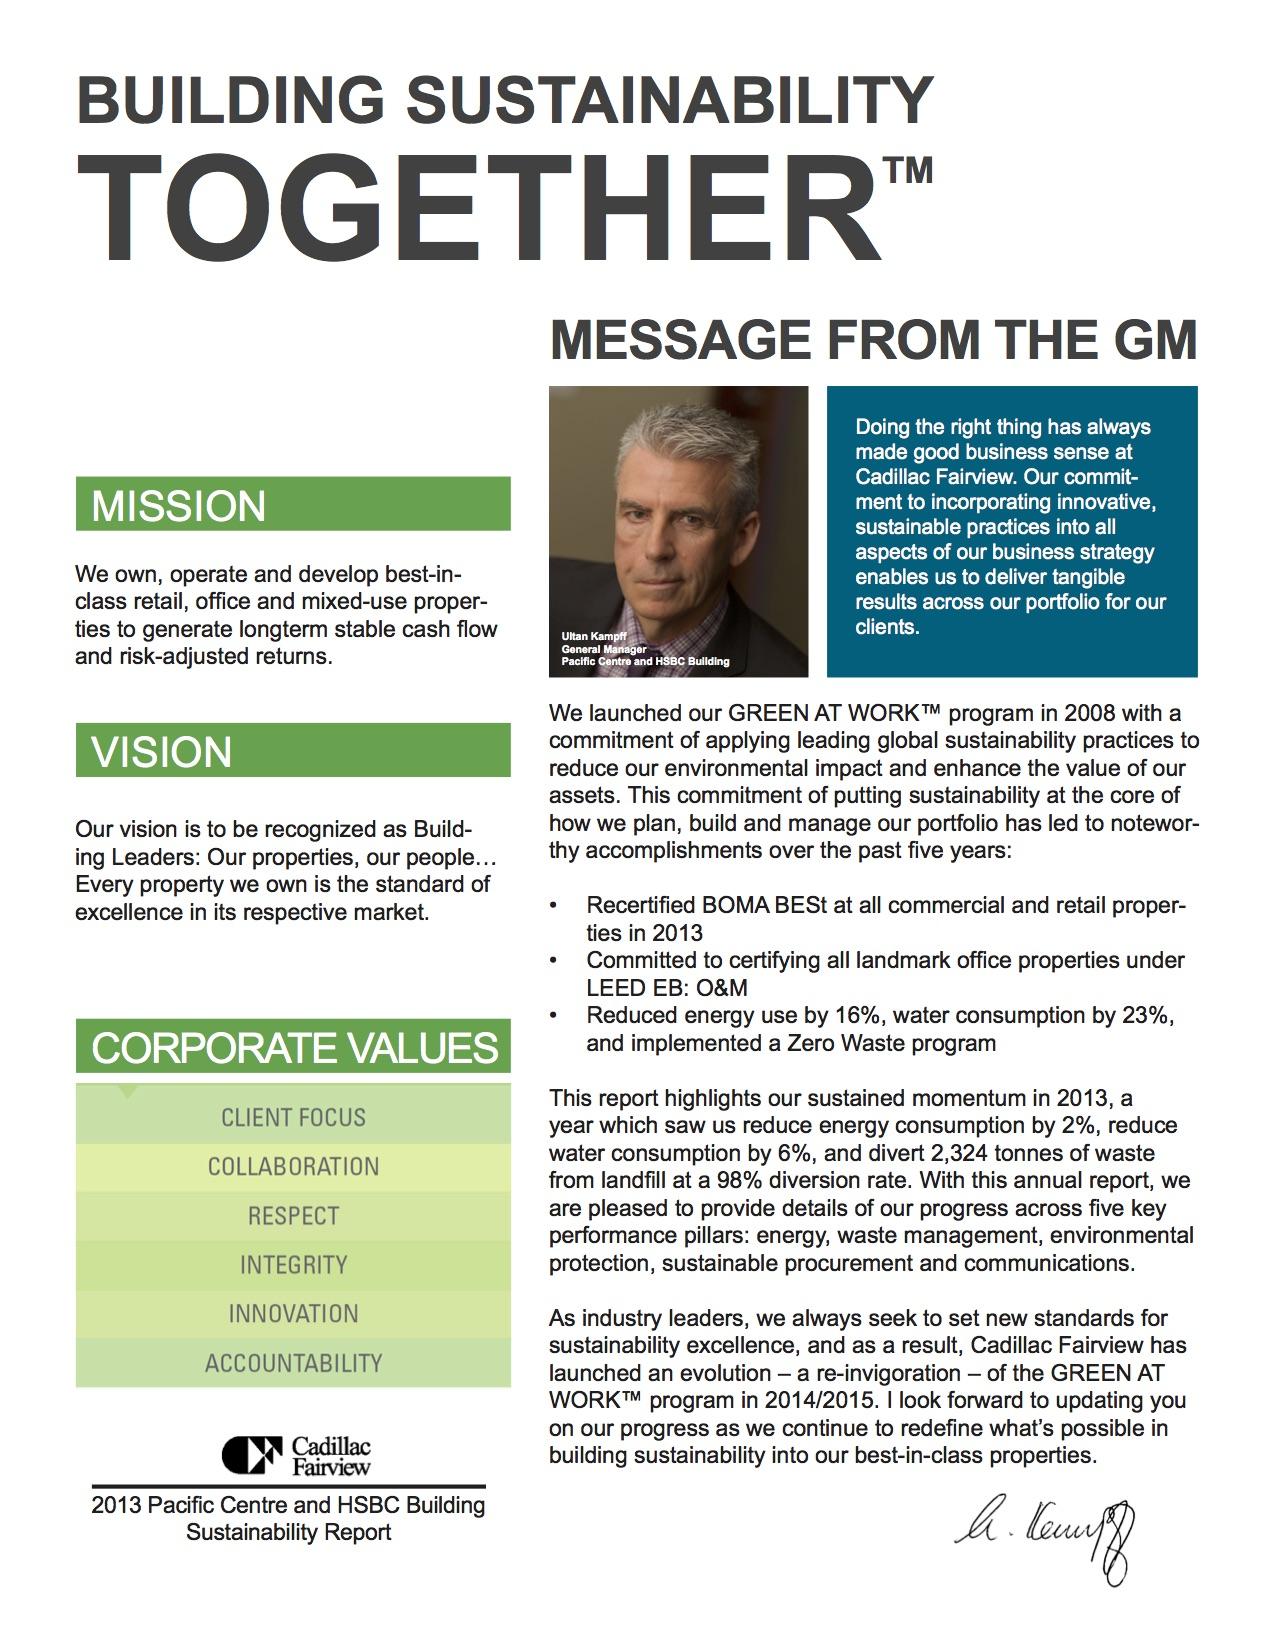 Vancouver Properties CRM